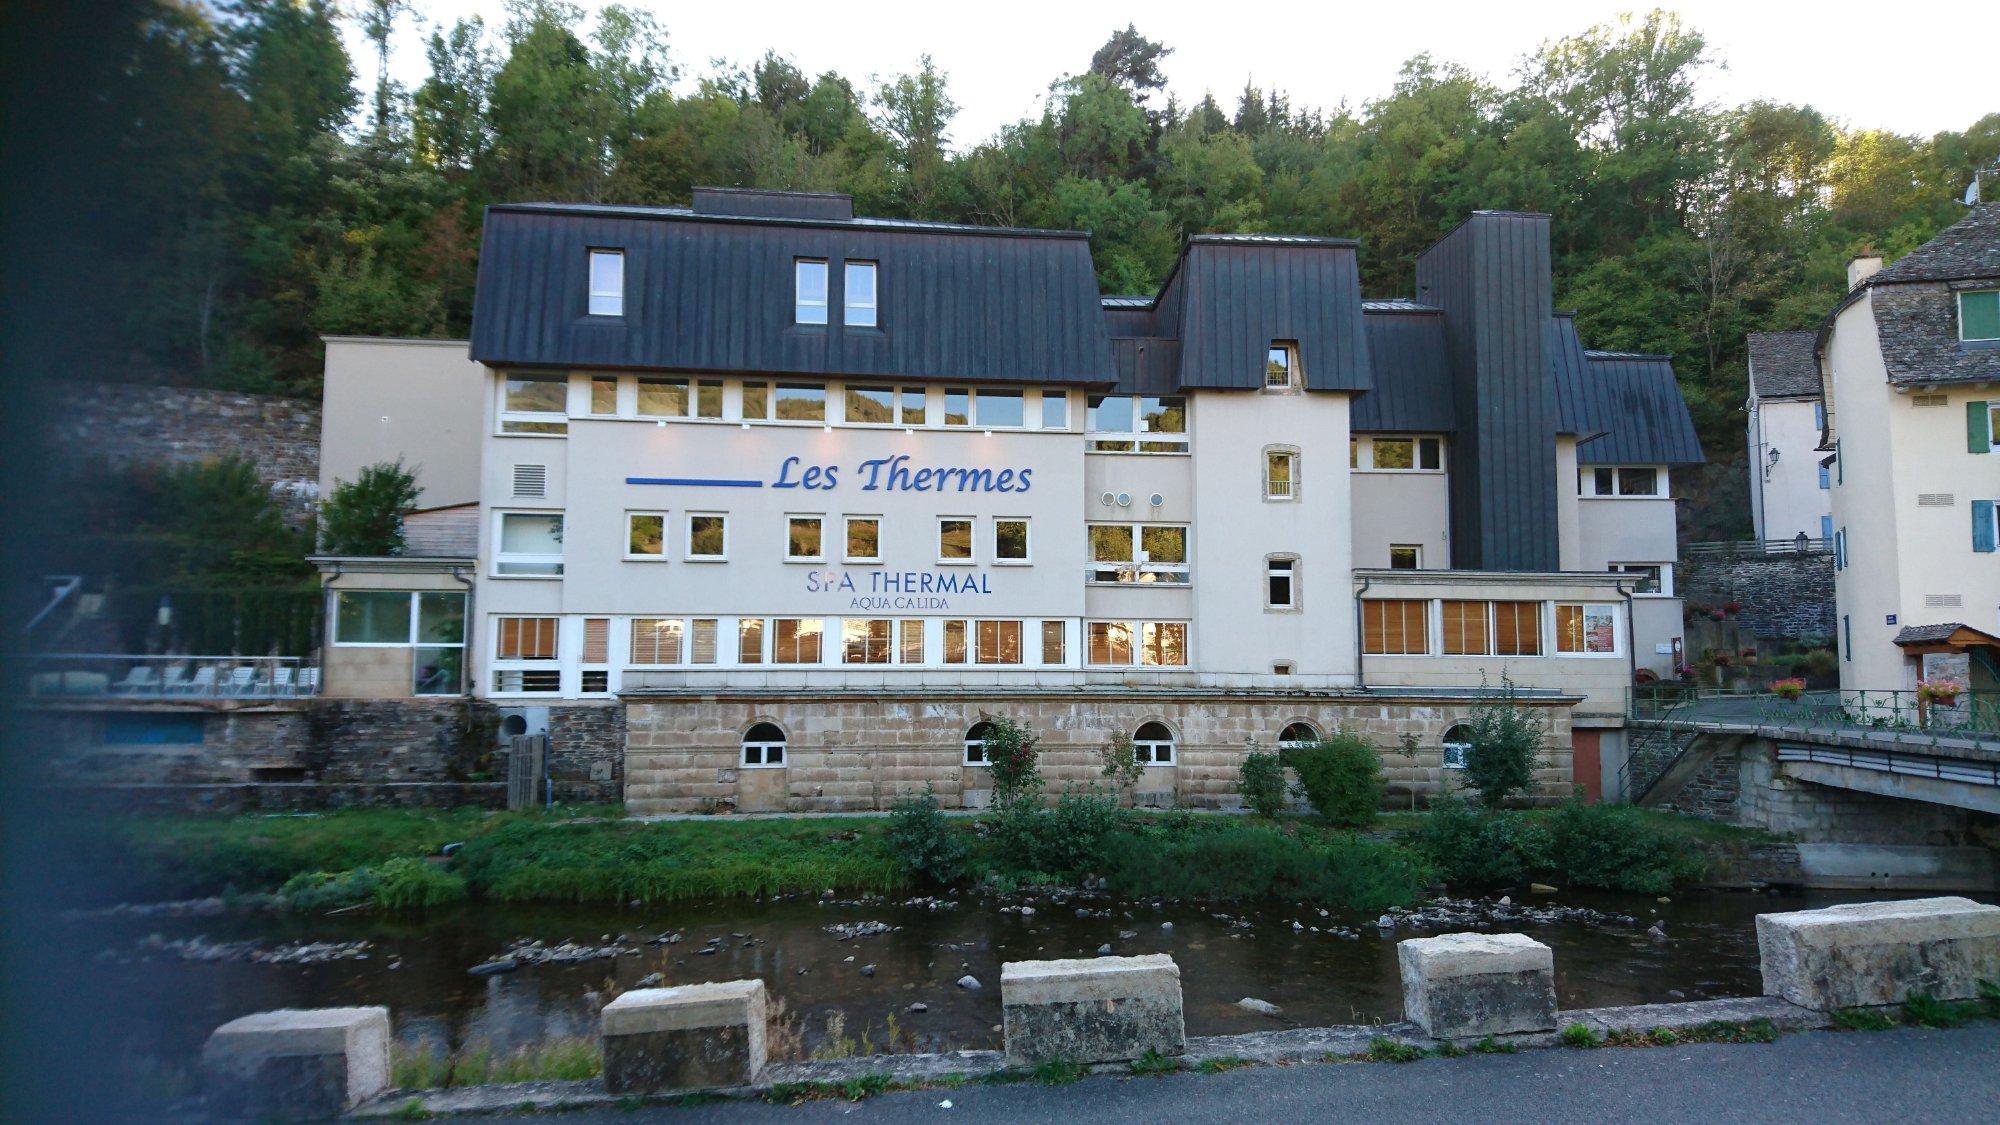 1525-thermes-bagnols-les-bains-48.jpg